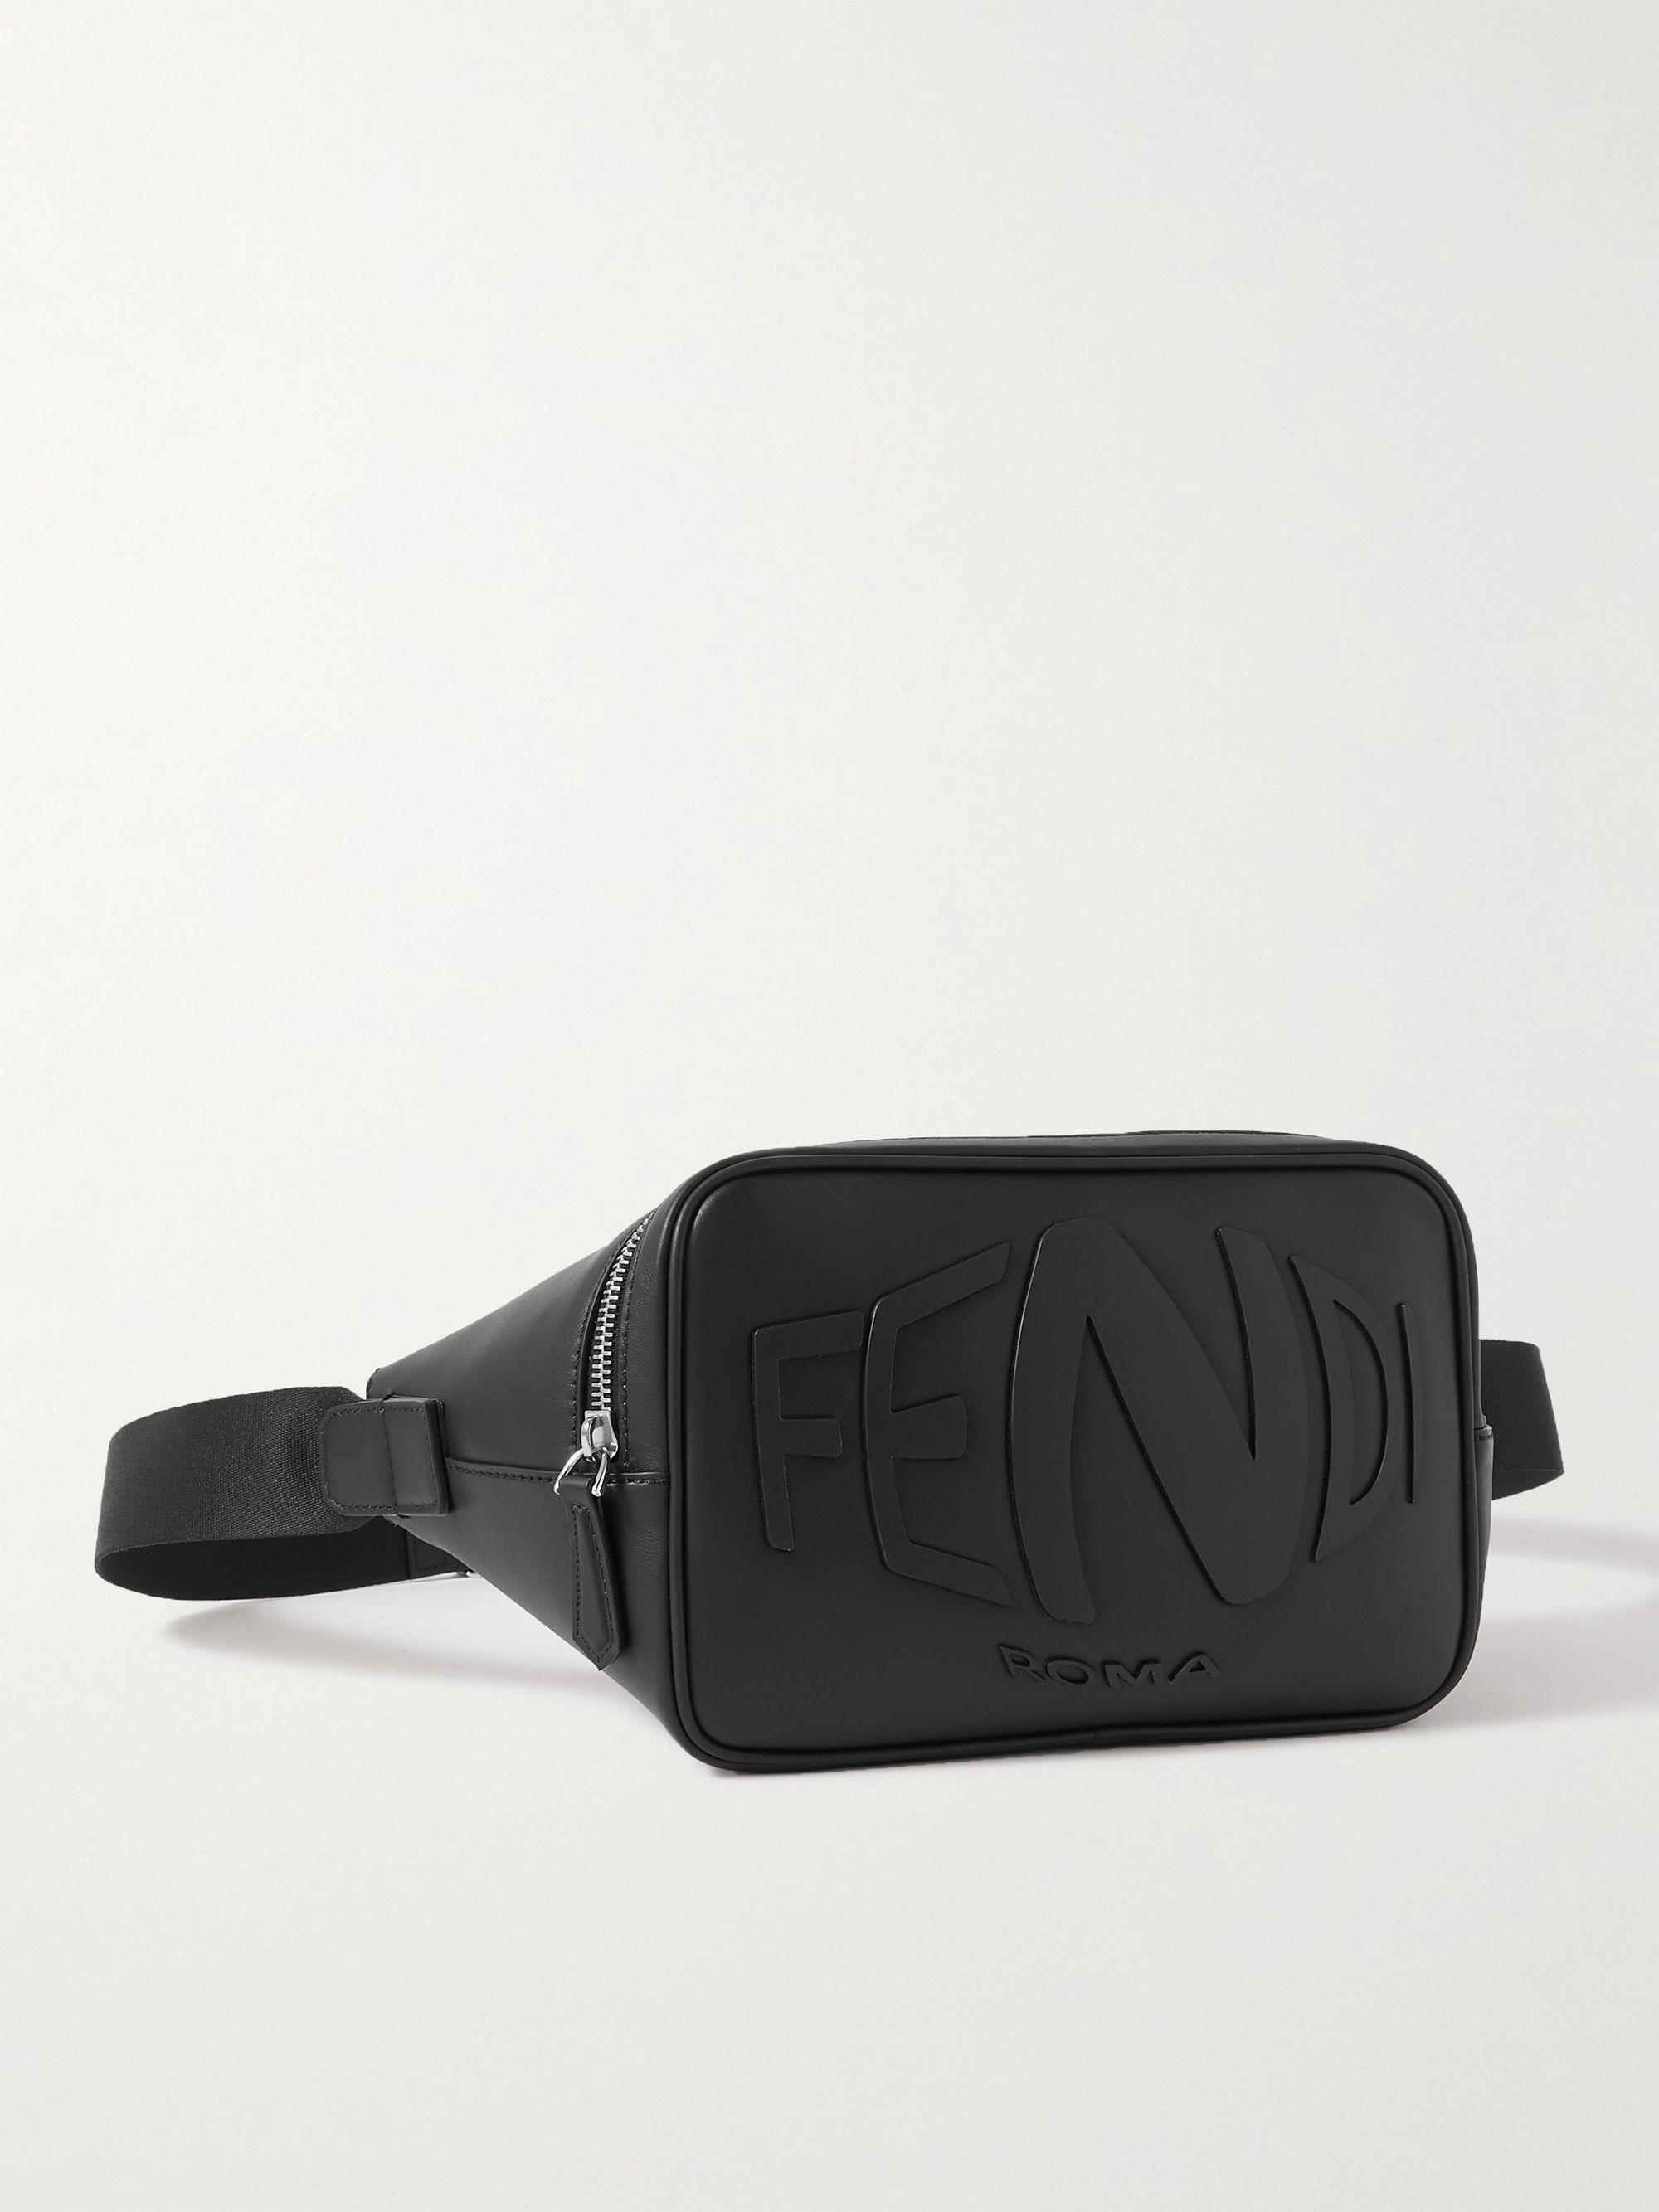 FENDI Logo-Embossed Leather Belt Bag